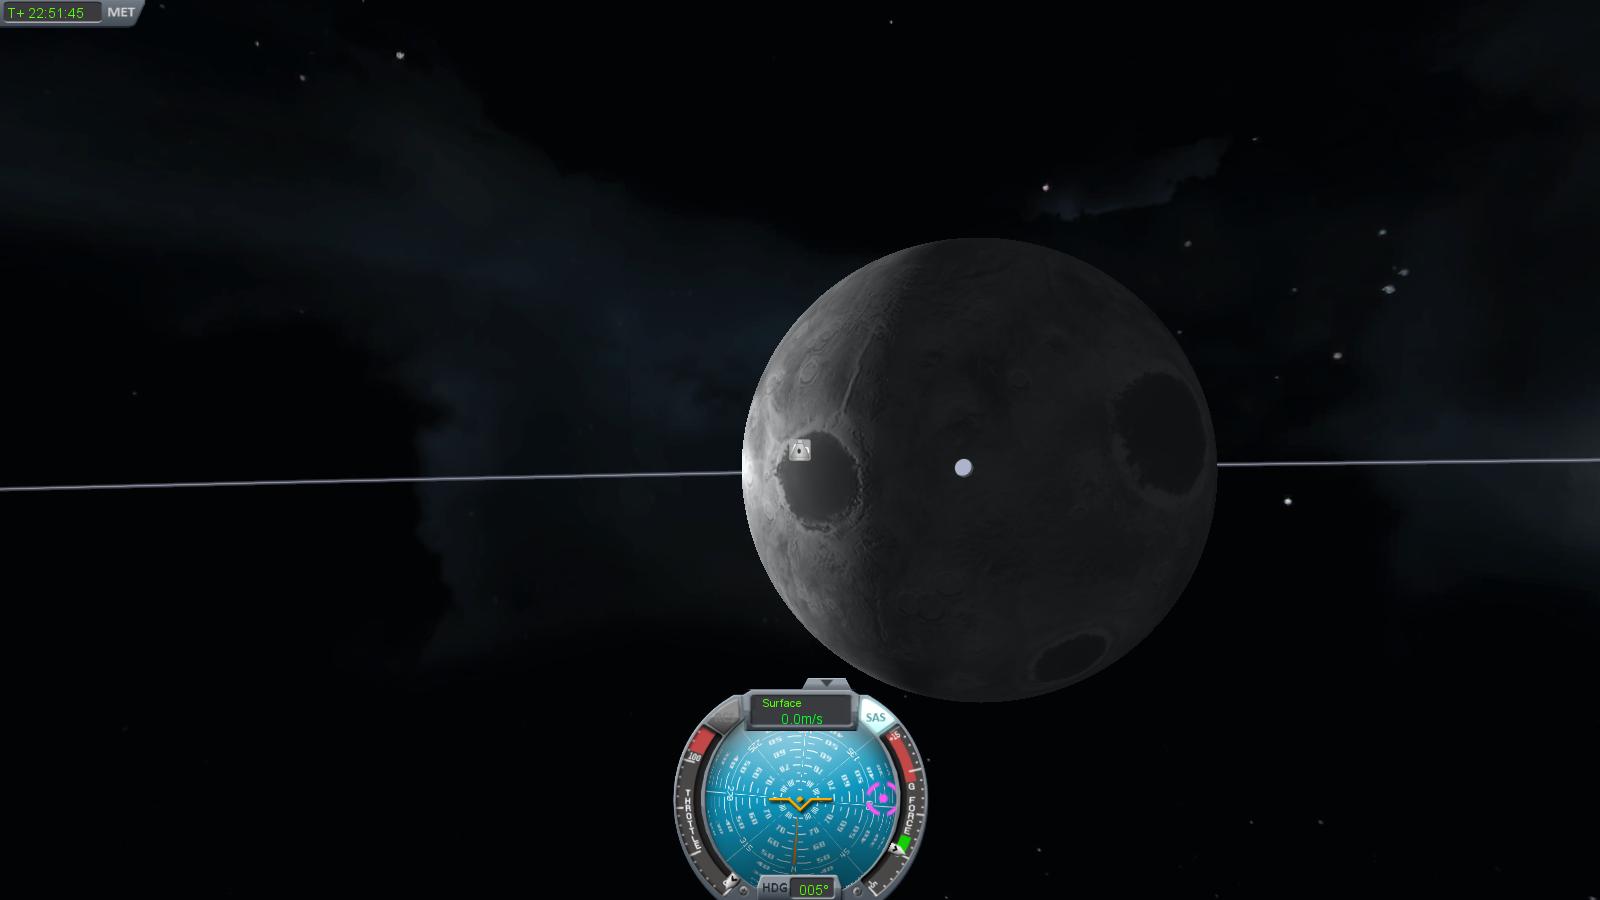 Kerbal Space Program Blog: January 2012